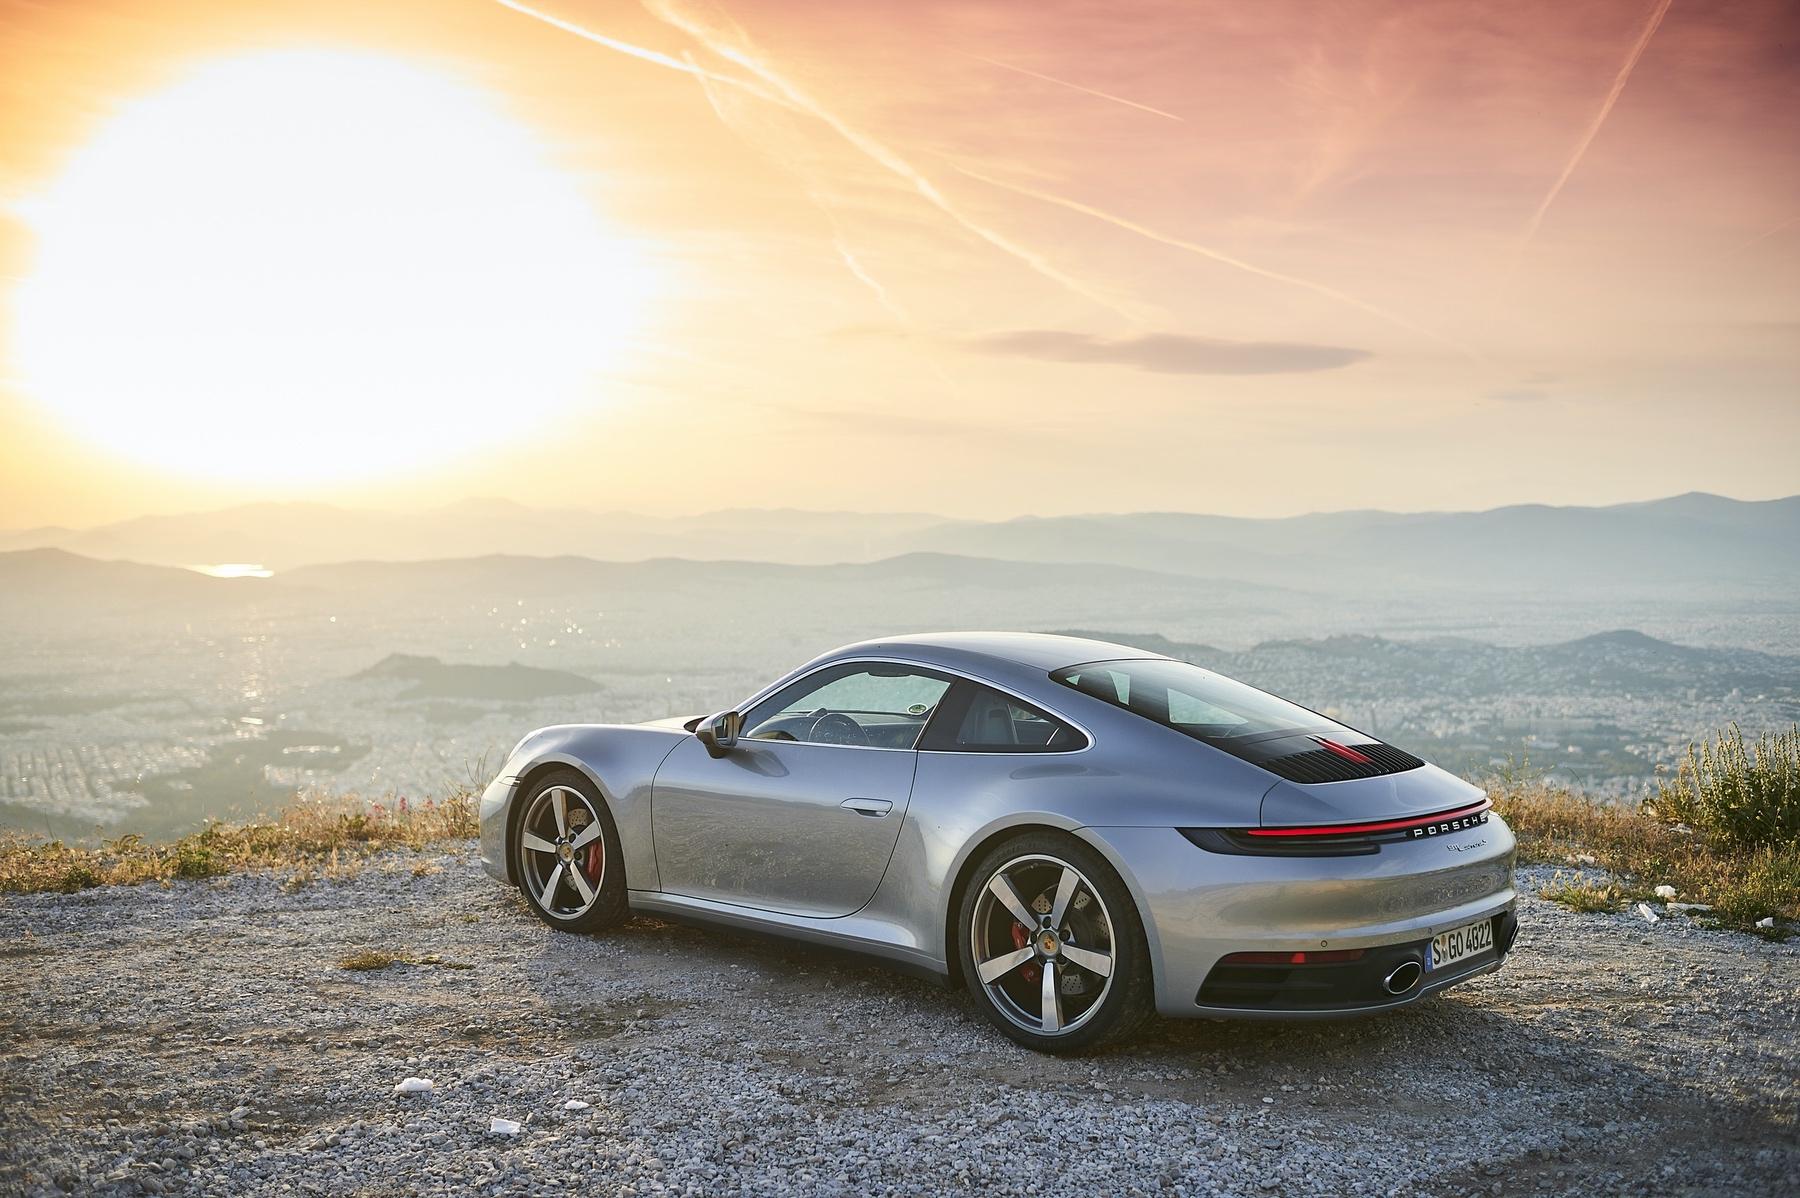 Test_Drive_Porsche_911_Athens_0055